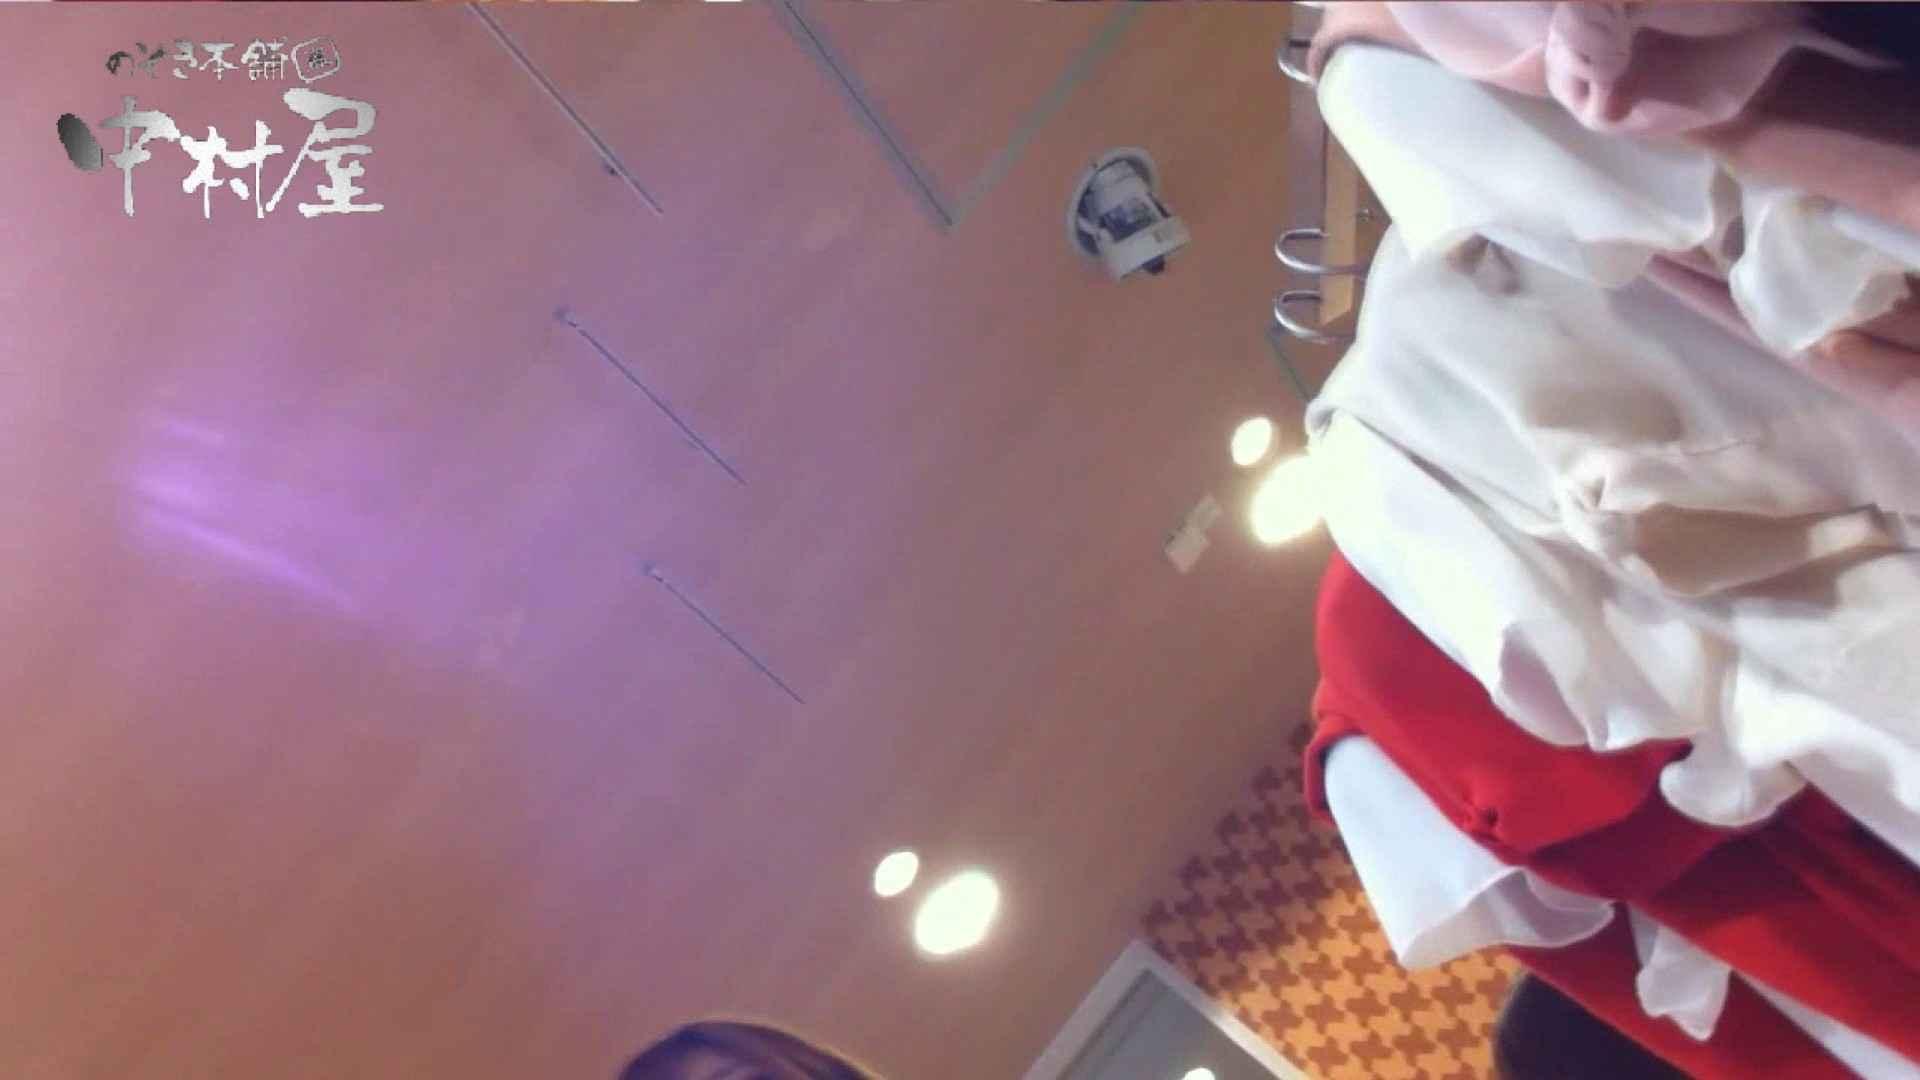 vol.48可愛いカリスマ店員胸チラ&パンチラ アニメ声の店員さん 胸チラ  96Pix 93